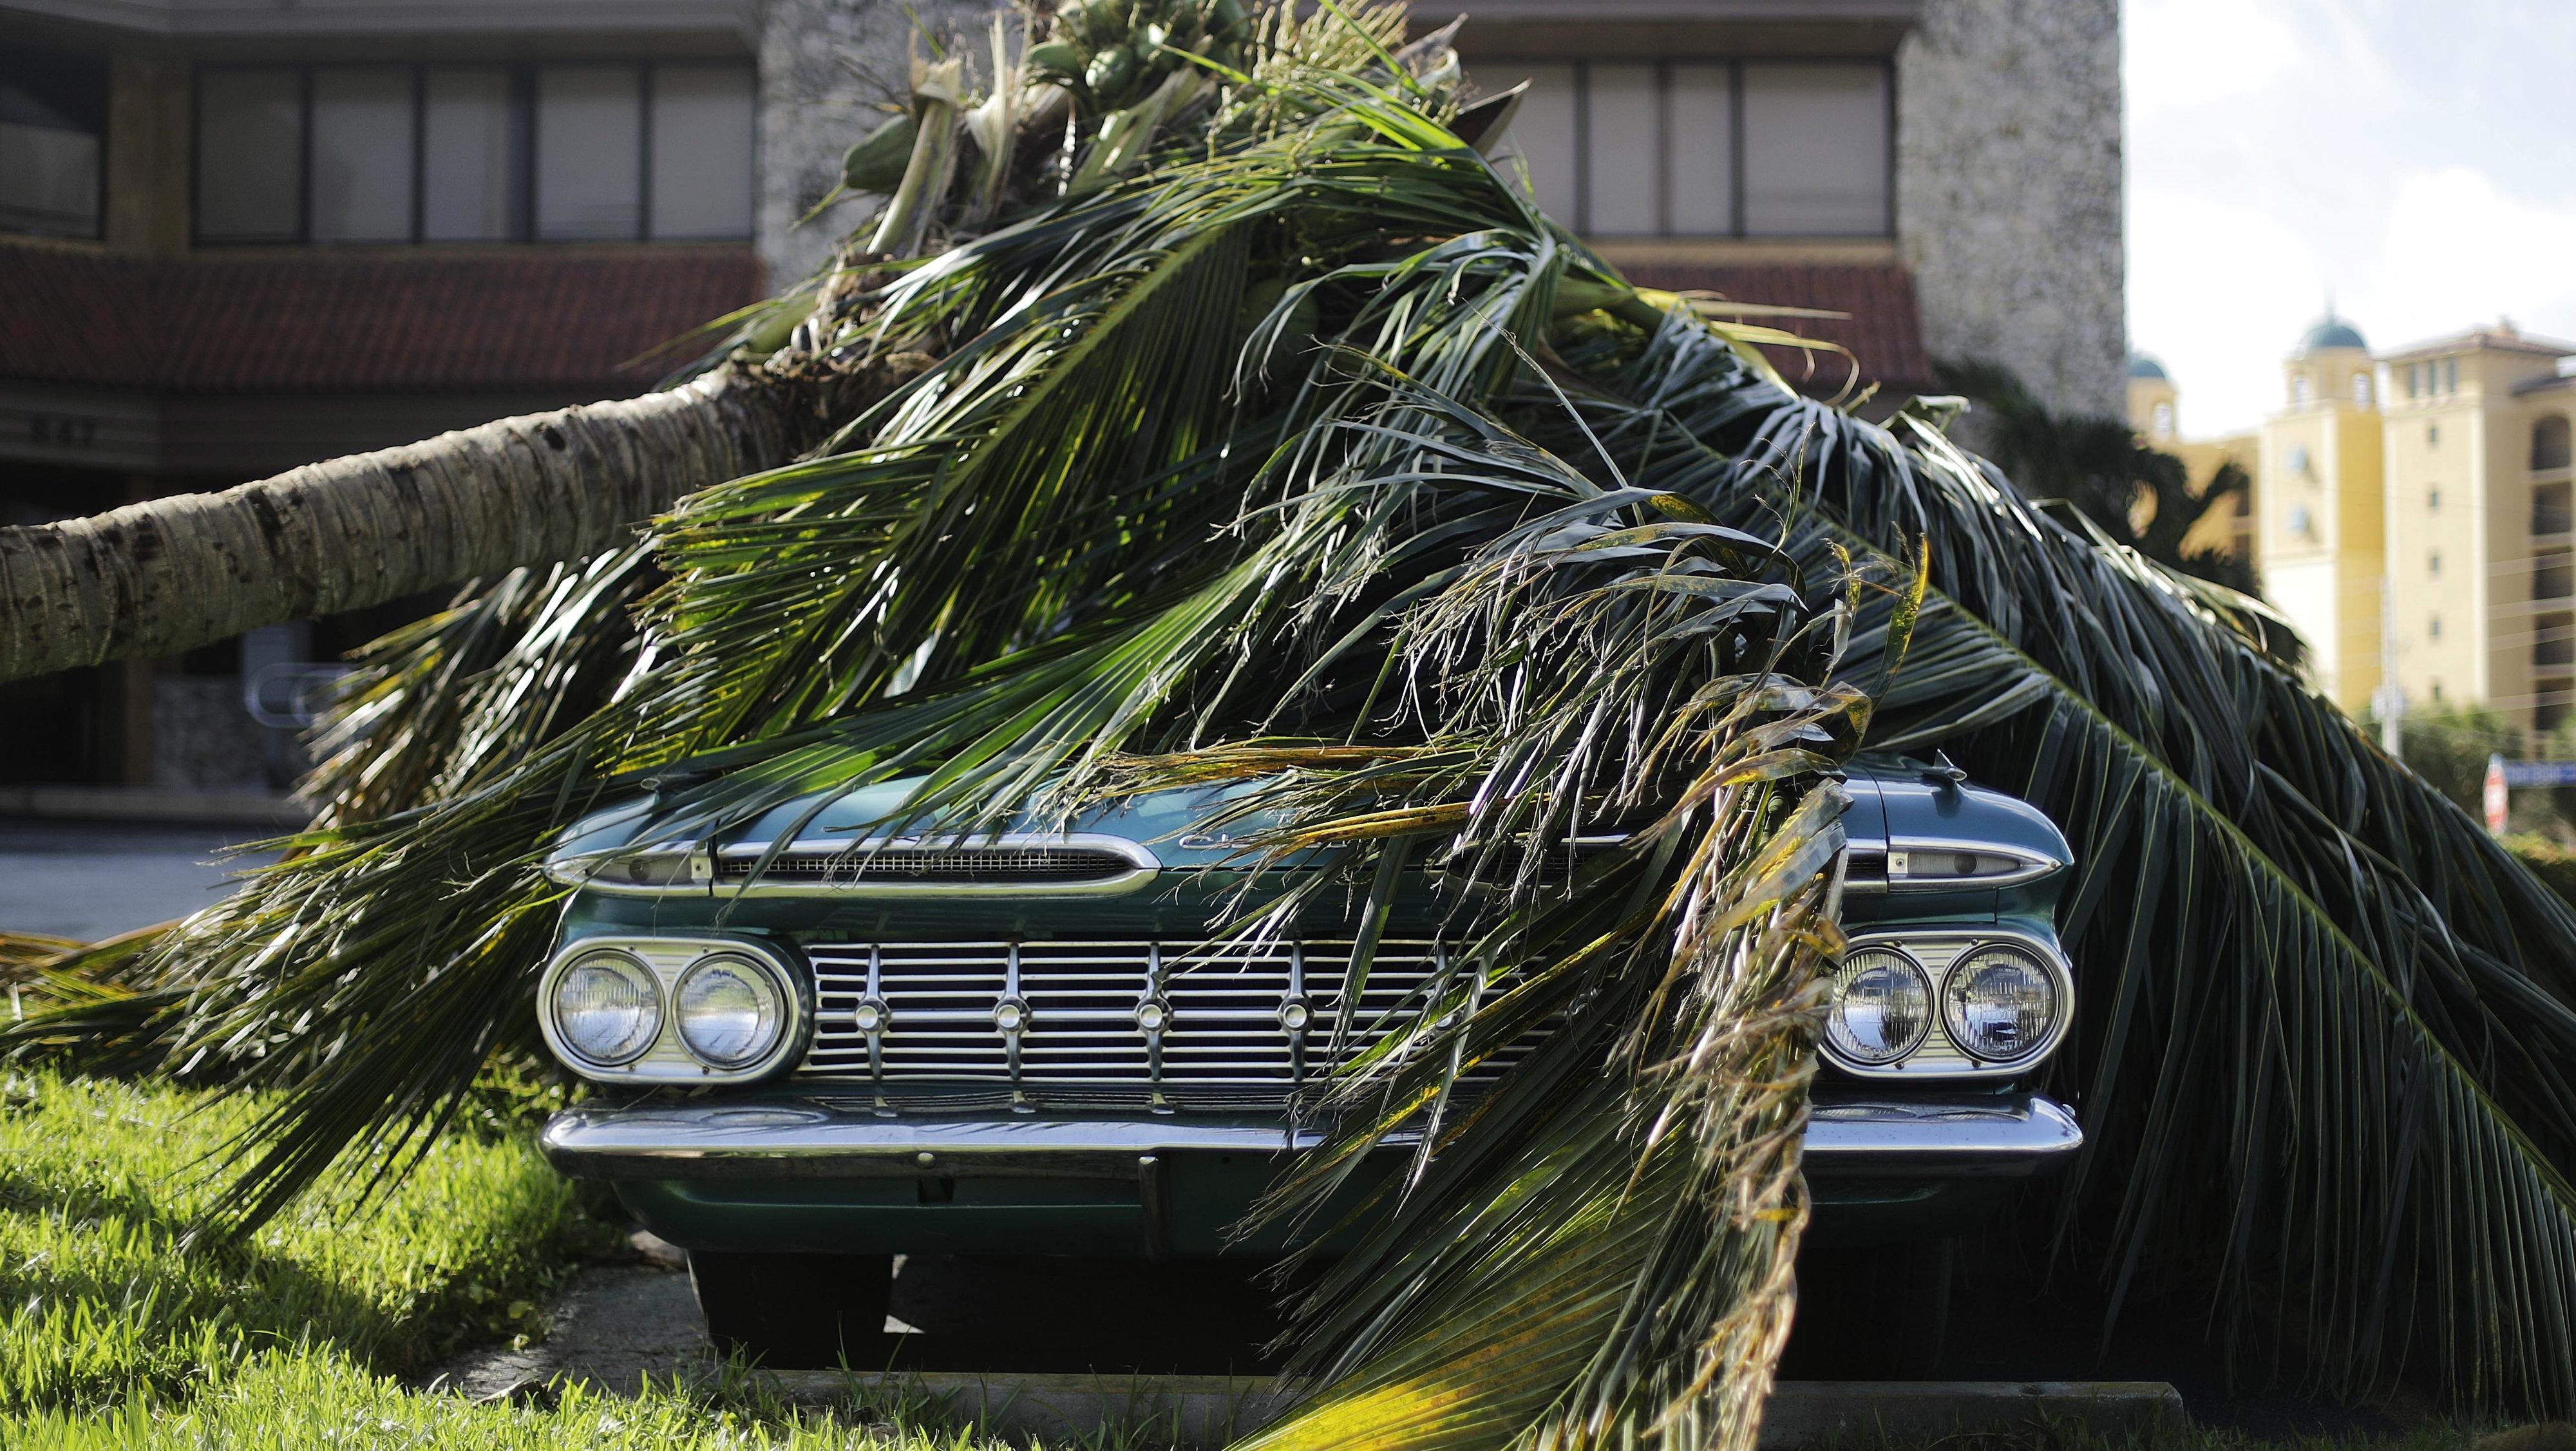 Car damaged by Hurricane Irma.